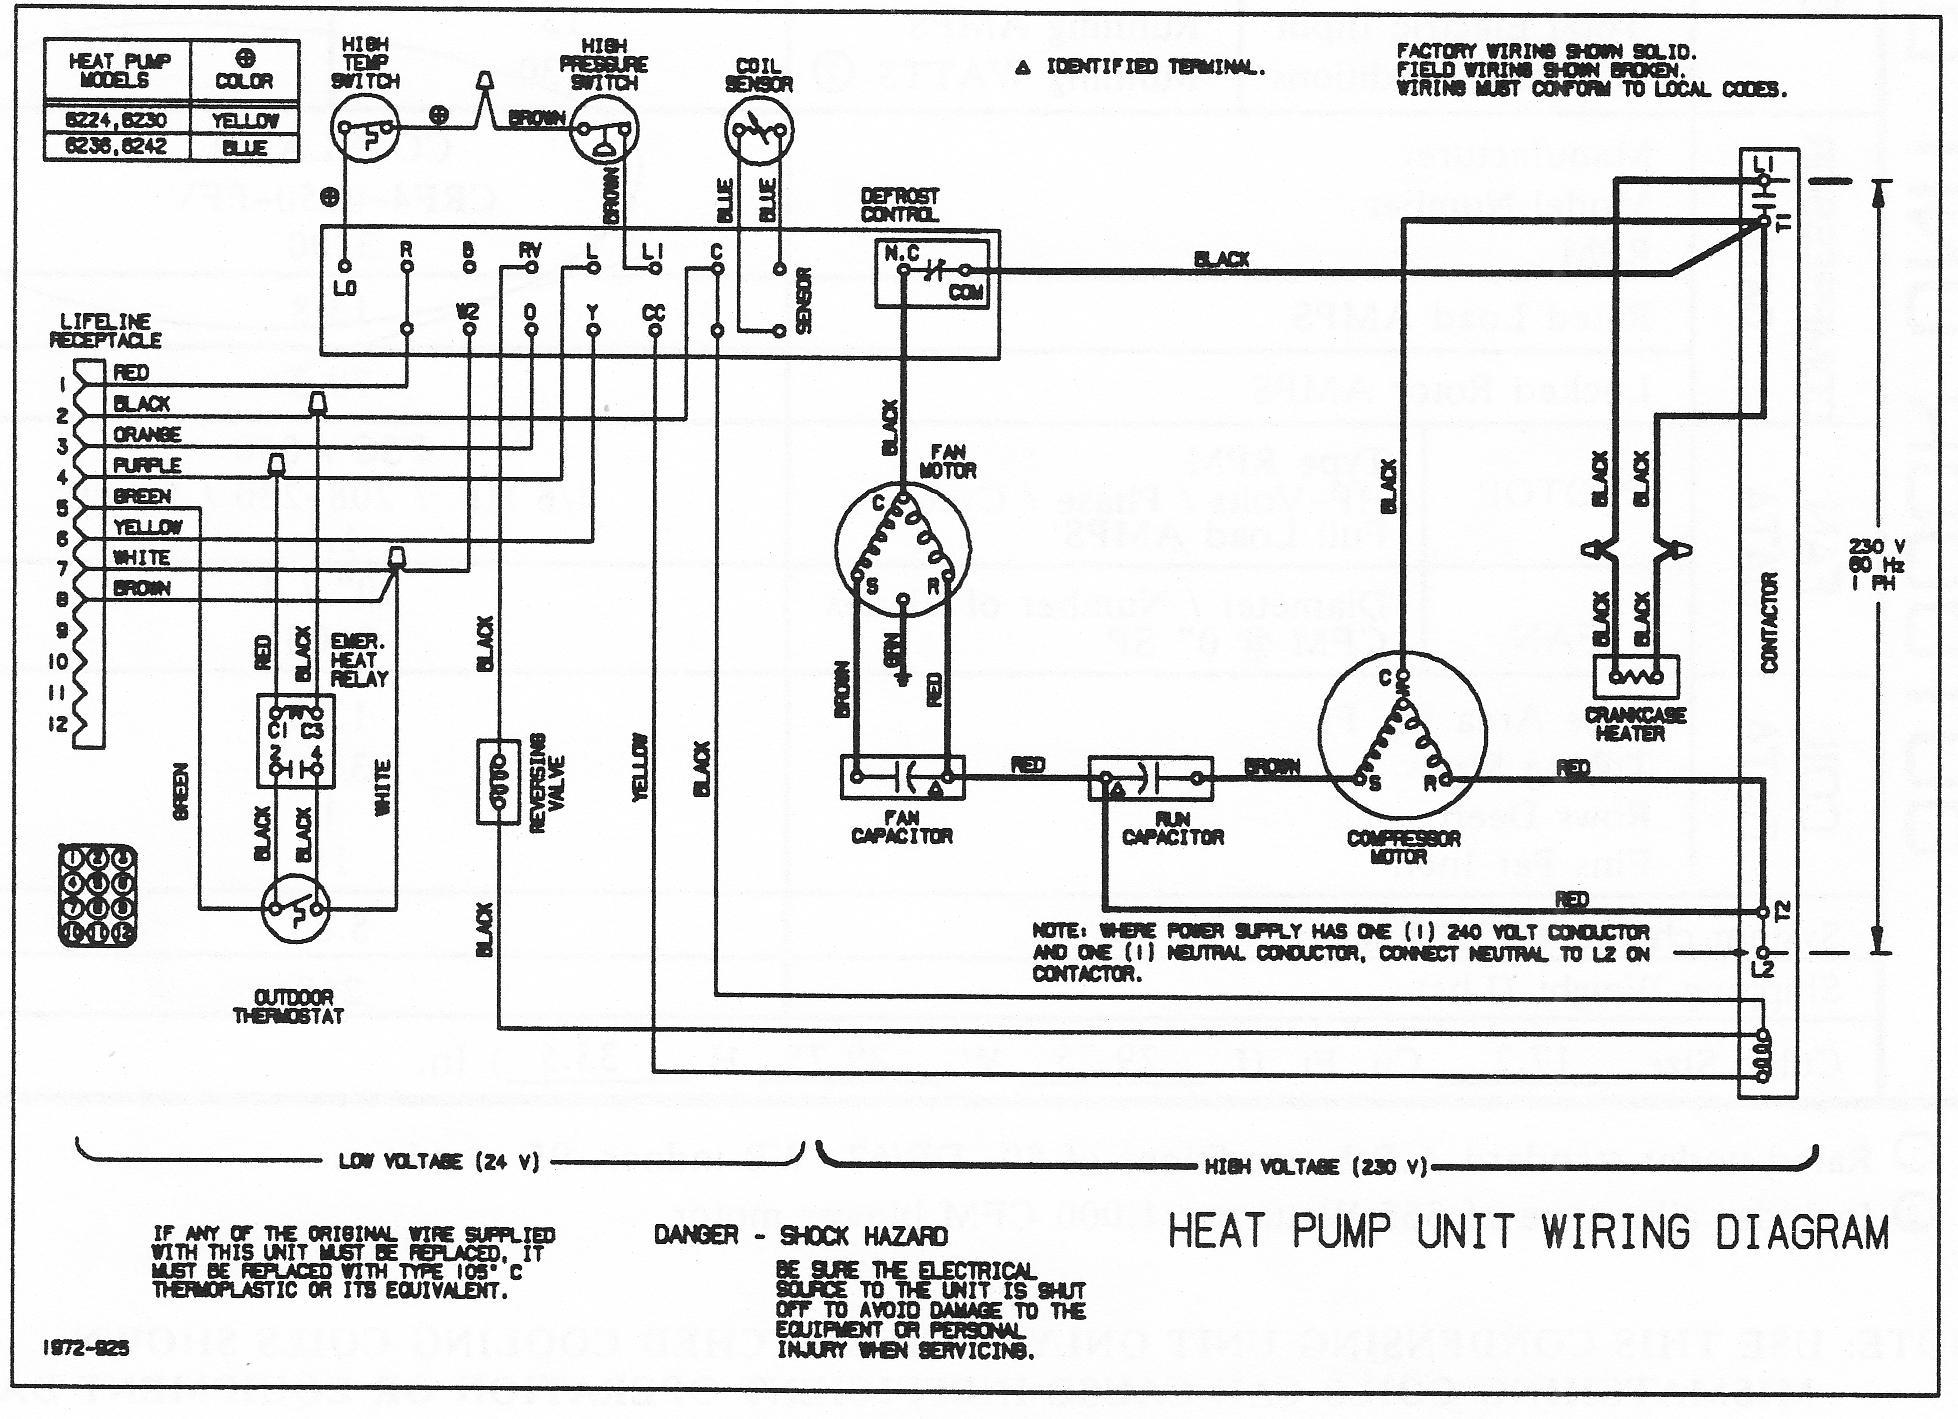 ot_3913] wiring diagram for coleman heat pump wiring diagram  sapebe simij ogeno sarc tron vulg elec mohammedshrine librar wiring 101